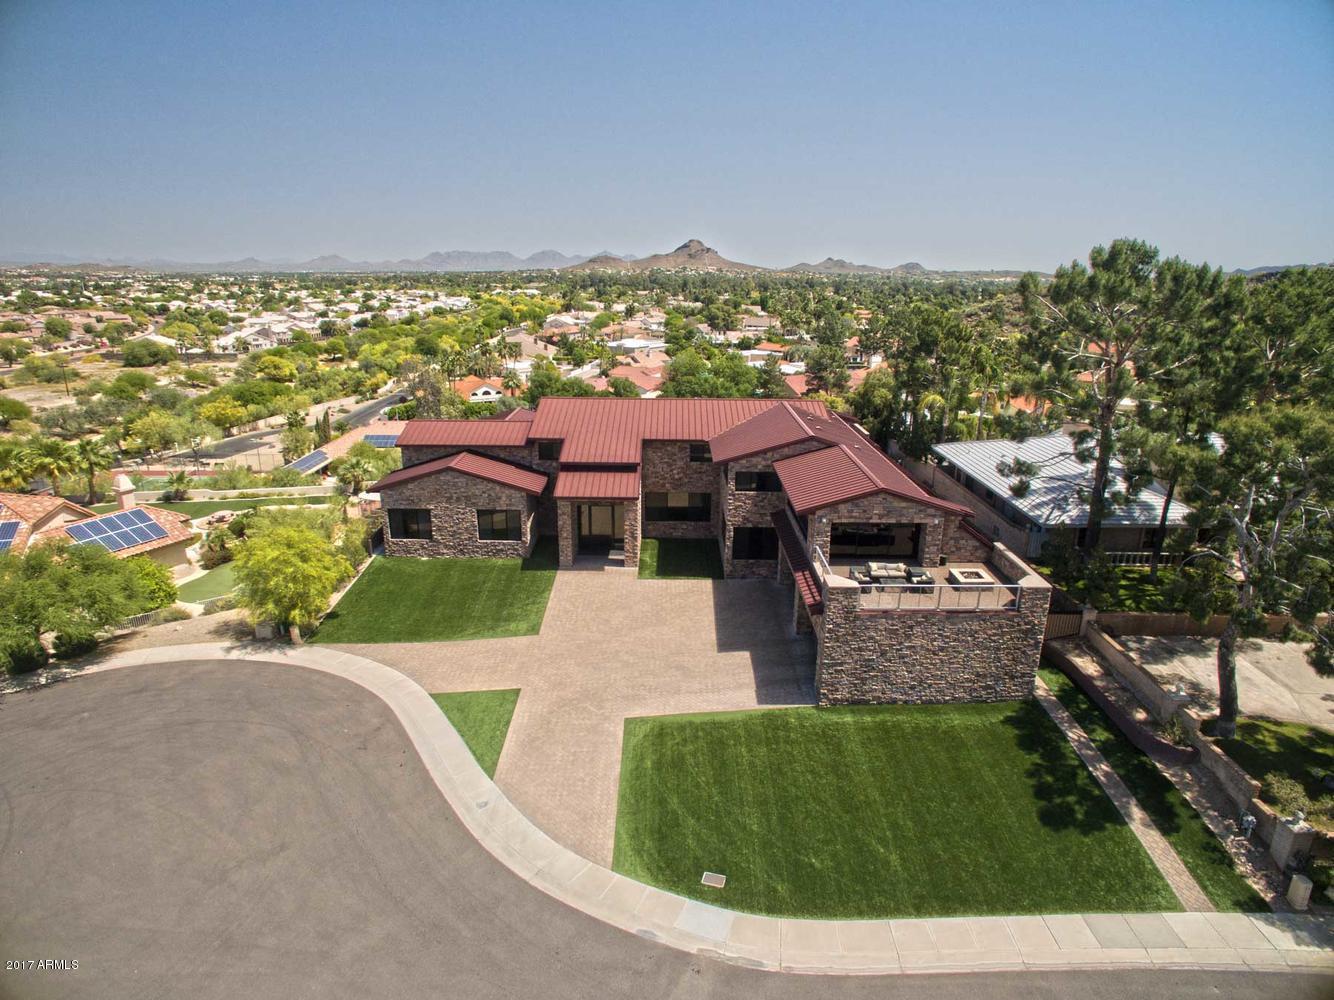 MLS 5592797 15217 N 15TH Drive, Phoenix, AZ 85023 Phoenix AZ Short Sale